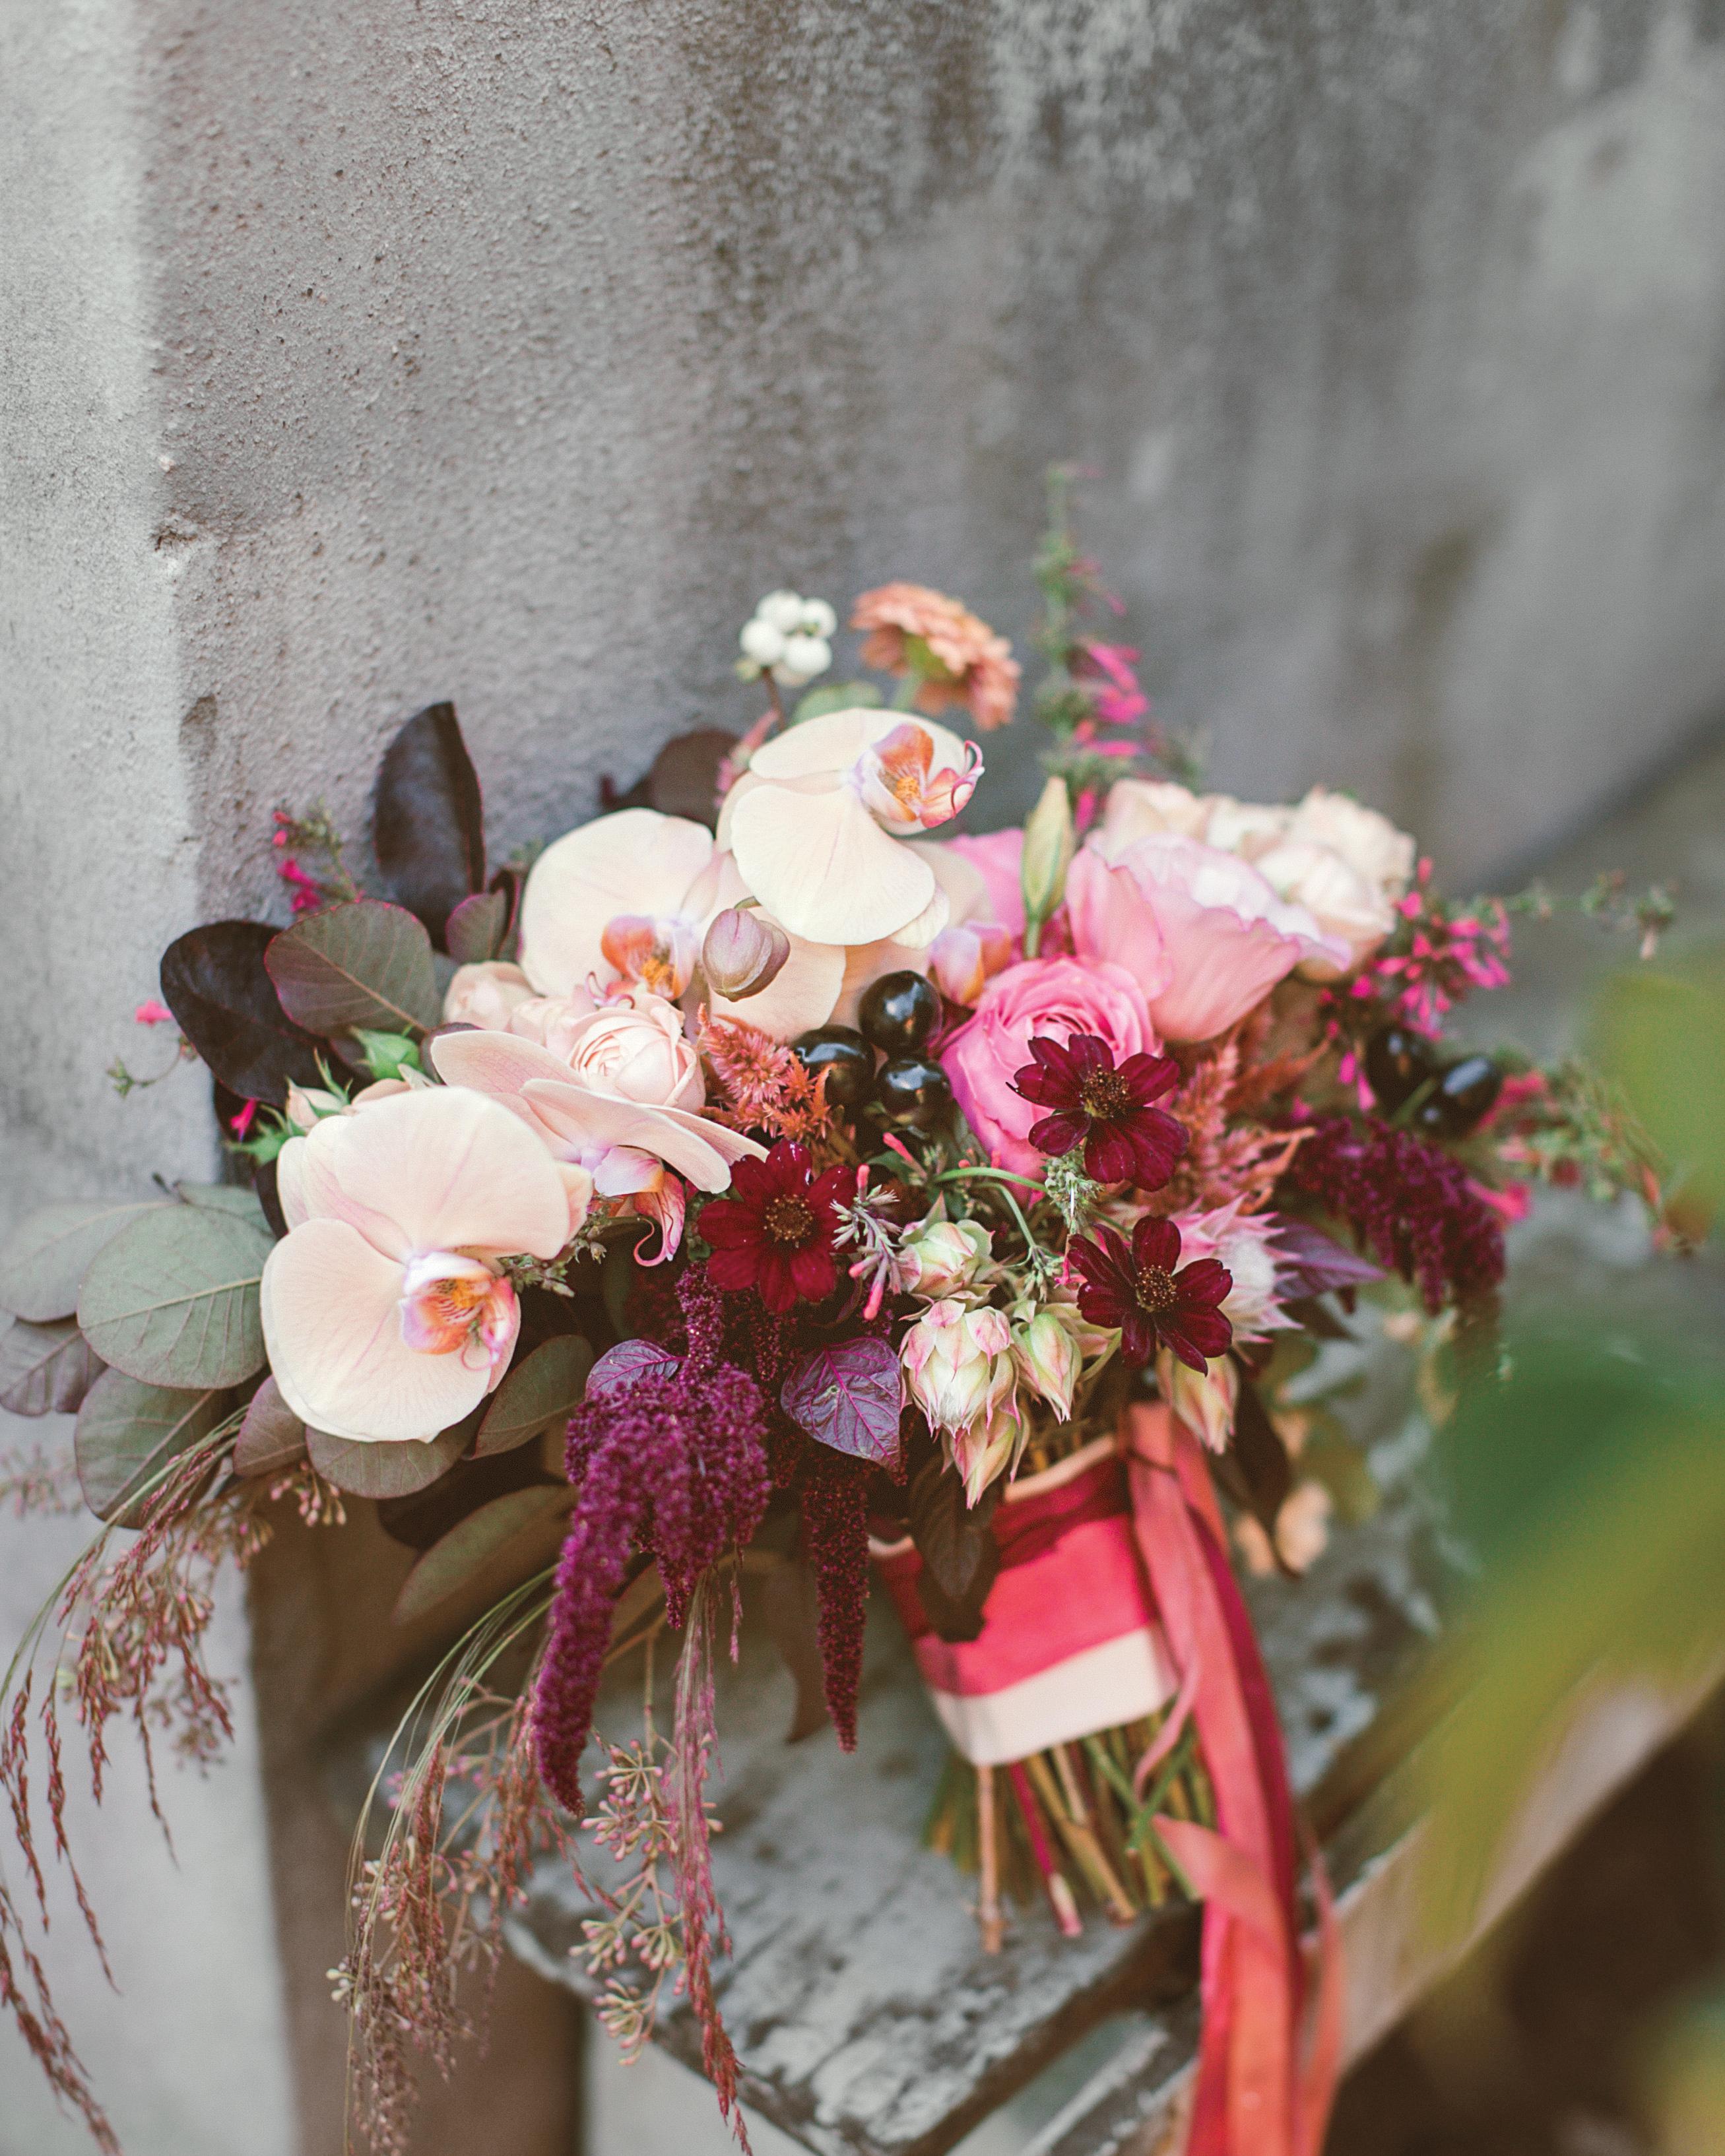 bouquet-jessicakirk108-mwds110827.jpg